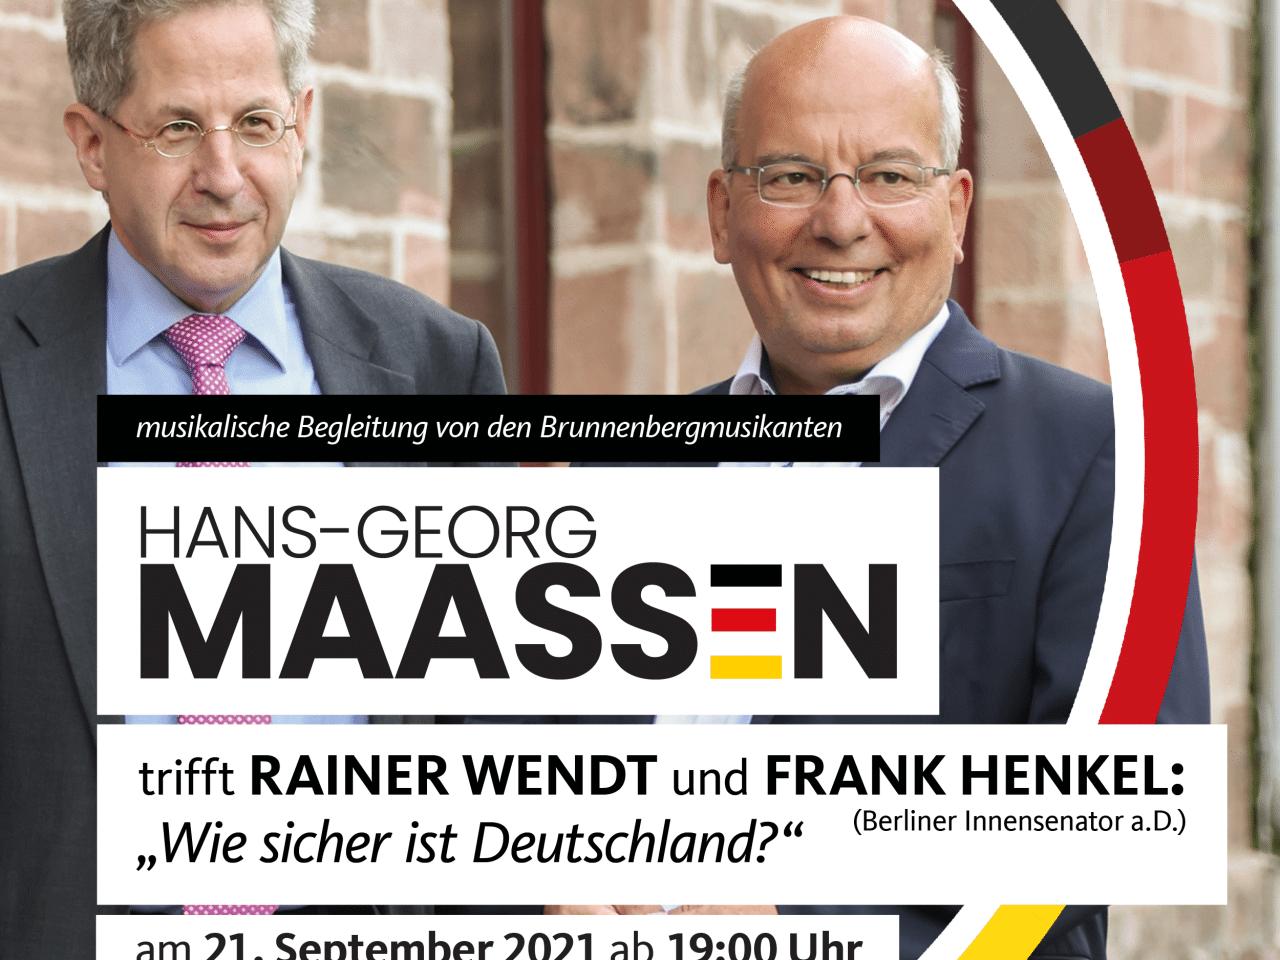 https://hgmaassen.com/wp-content/uploads/2021/09/Kachel_Wendt2-1280x960.png